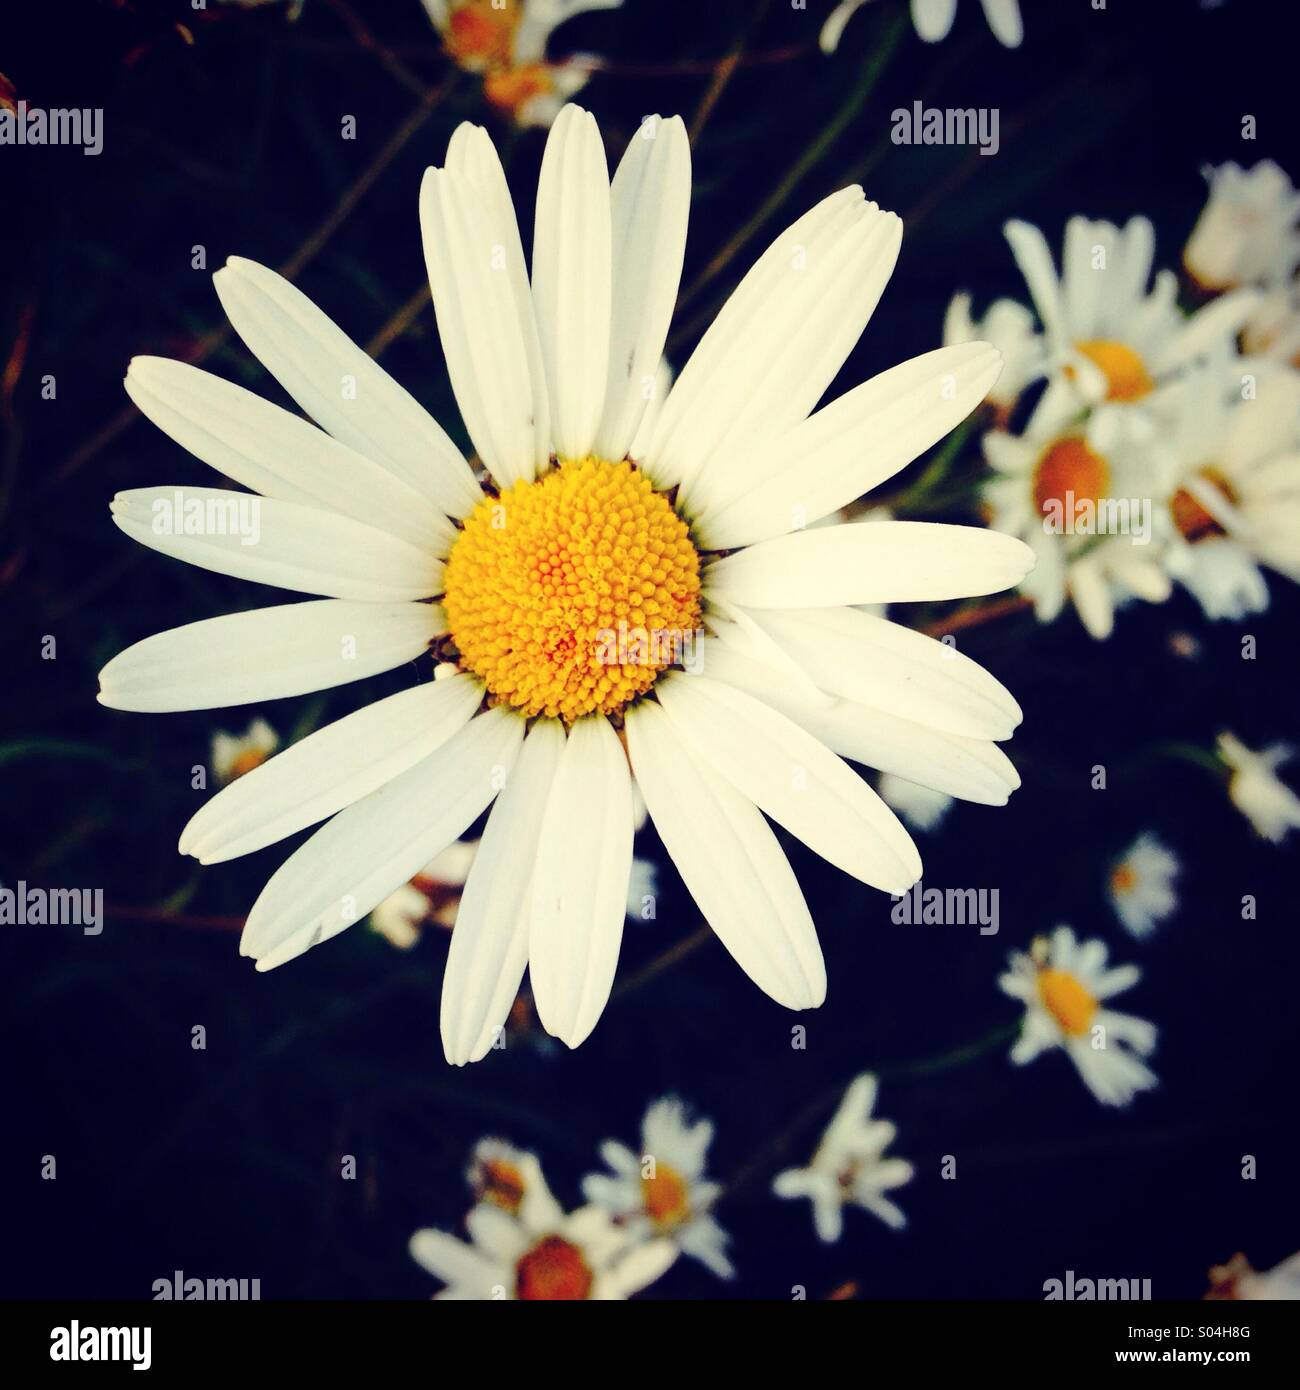 Daisy flower - Stock Image